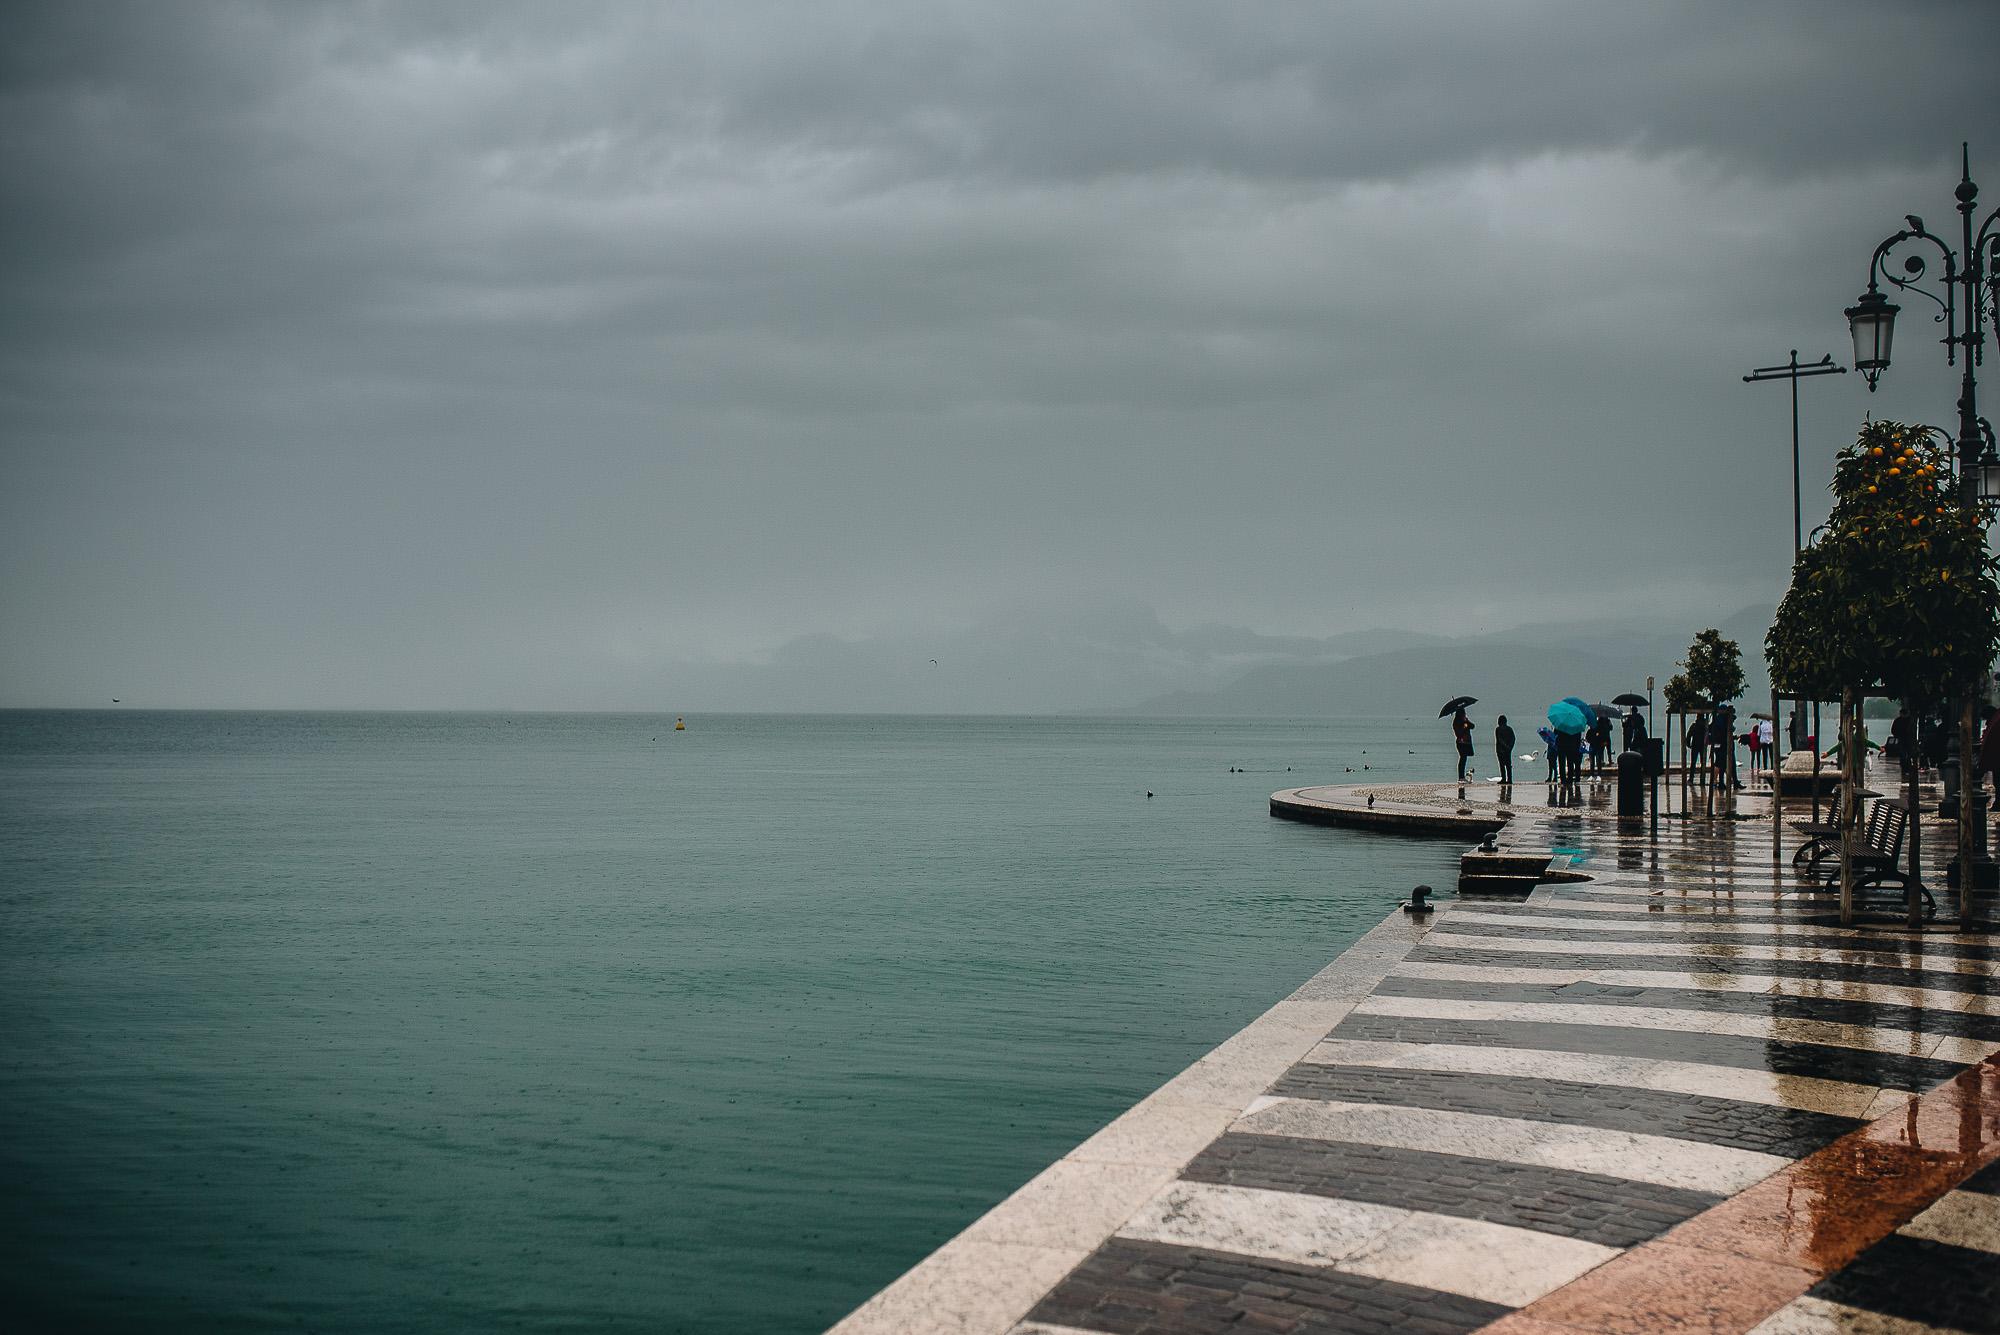 OurBeautifulAdventure-LakeGarda-Italy-Blog-0662.jpg